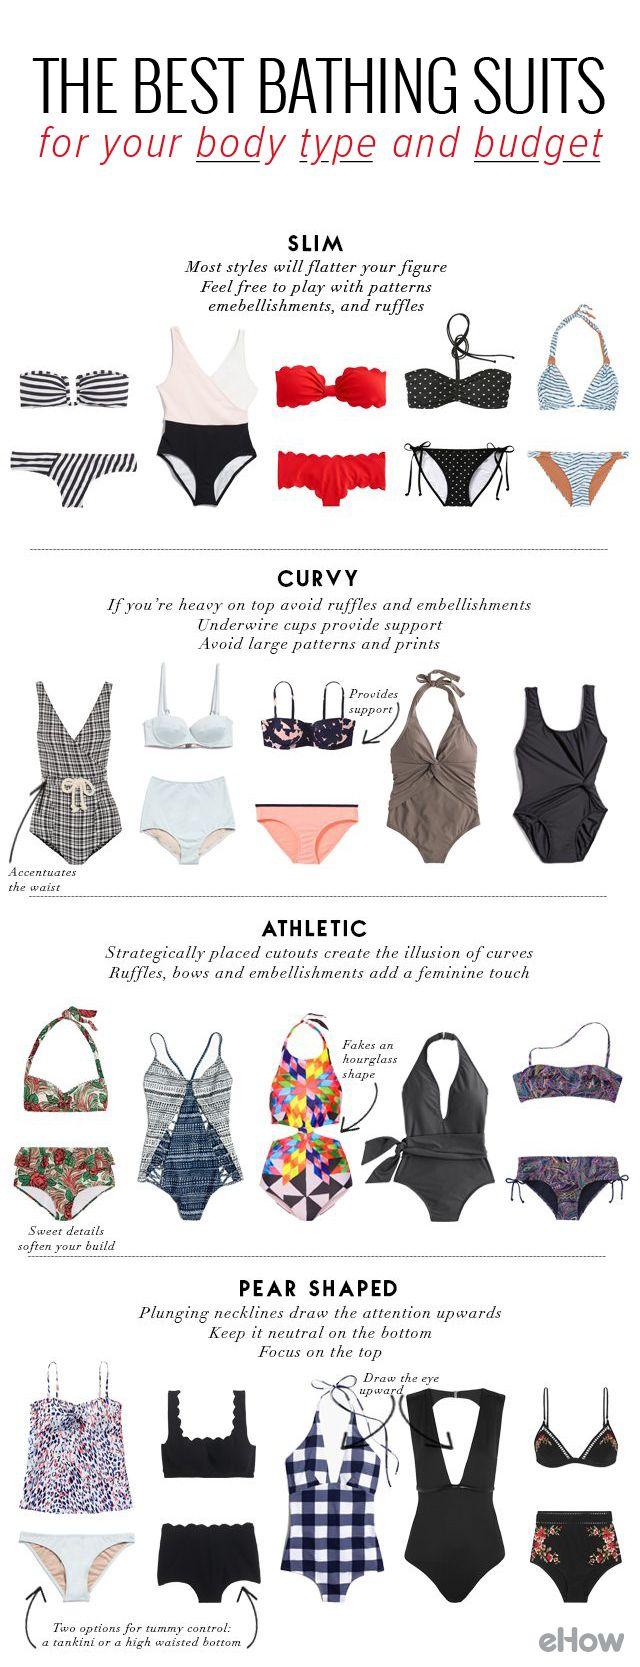 Pin by eHow on Women's Fashion & Style DIY | Cipők, Divat ...